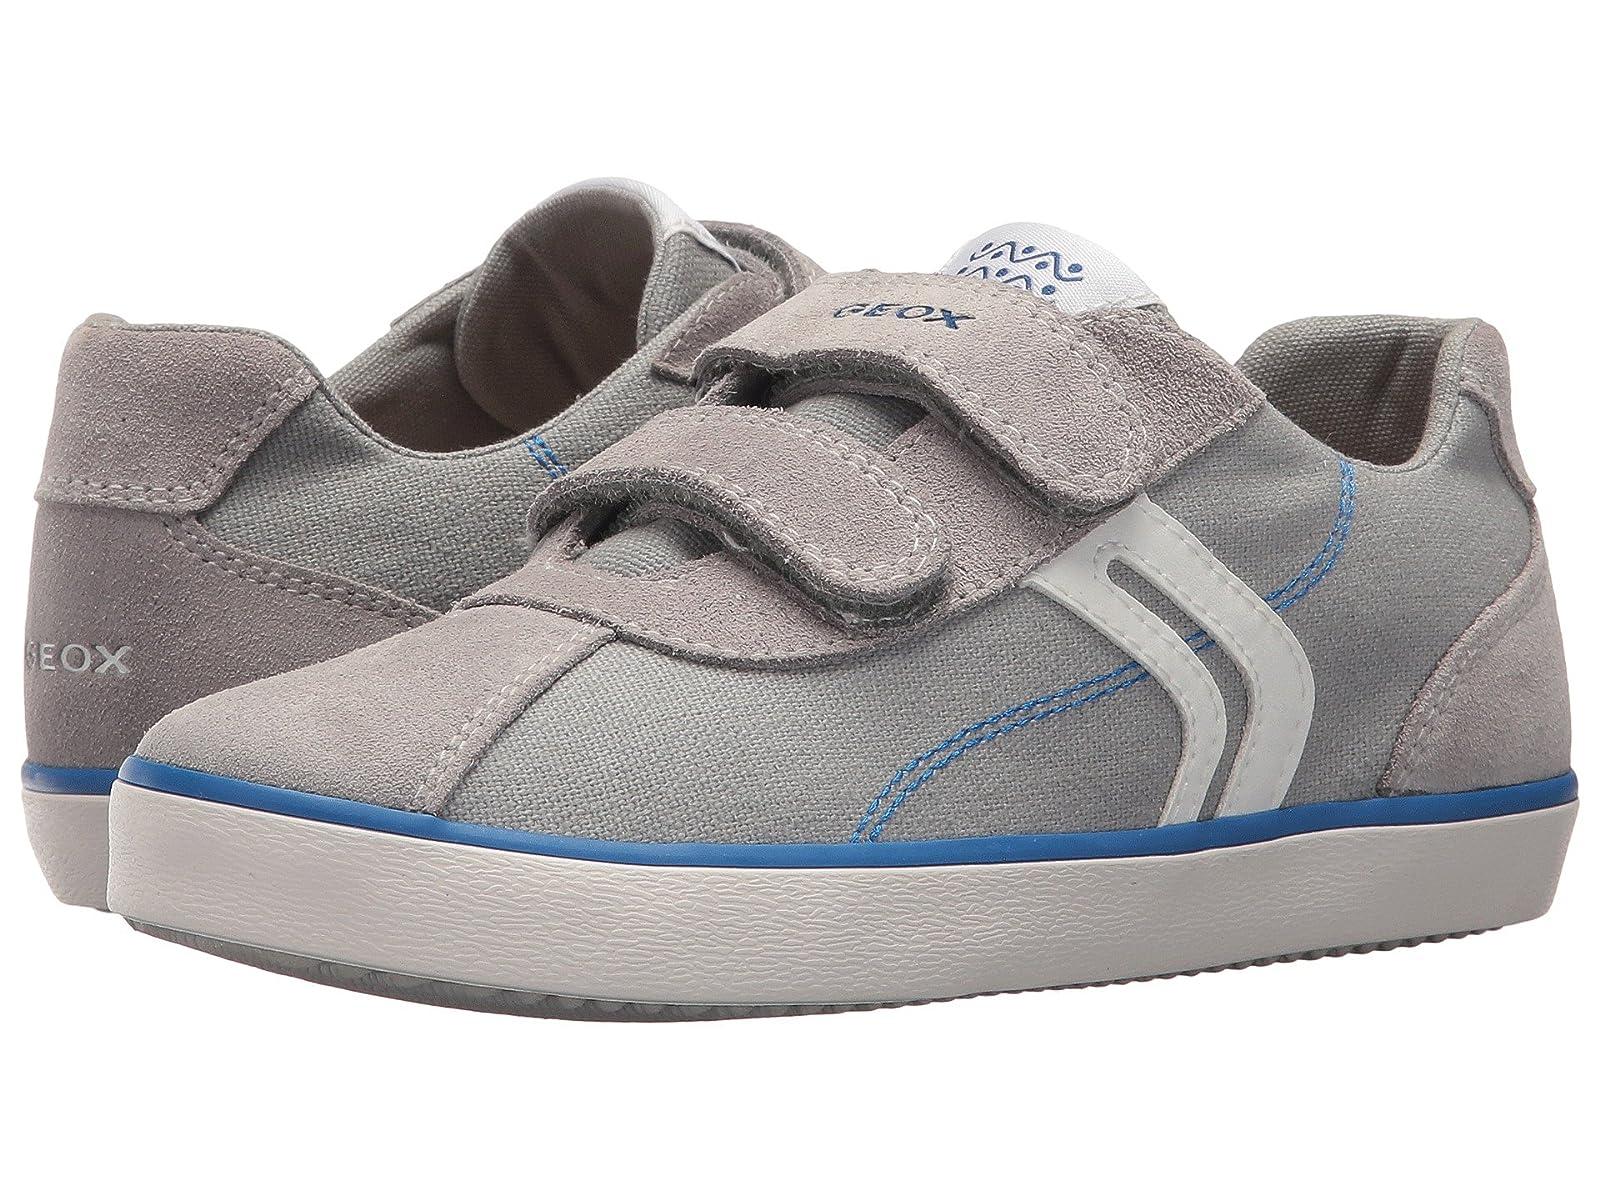 Geox Kids Kilwi 12 (Little Kid/Big Kid)Atmospheric grades have affordable shoes